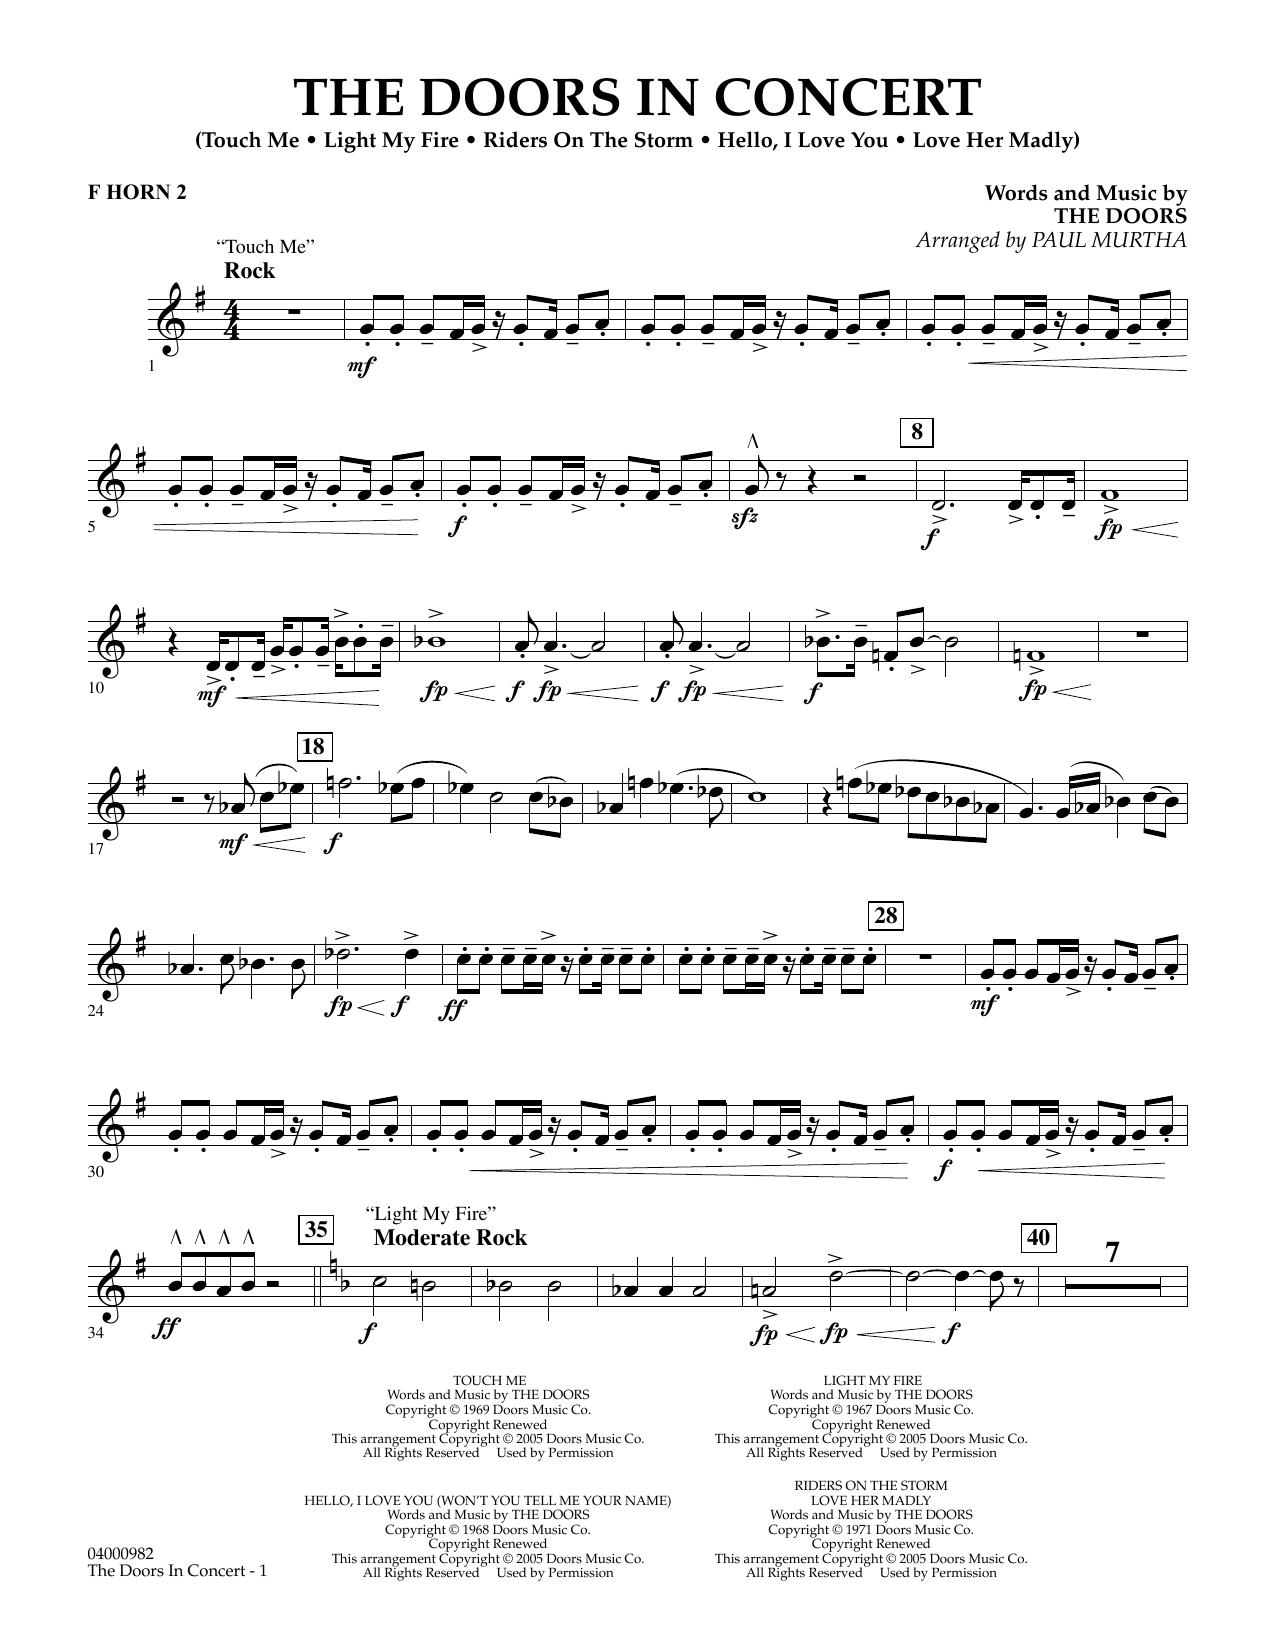 The Doors in Concert (arr. Paul Murtha) - F Horn 2 (Concert Band)